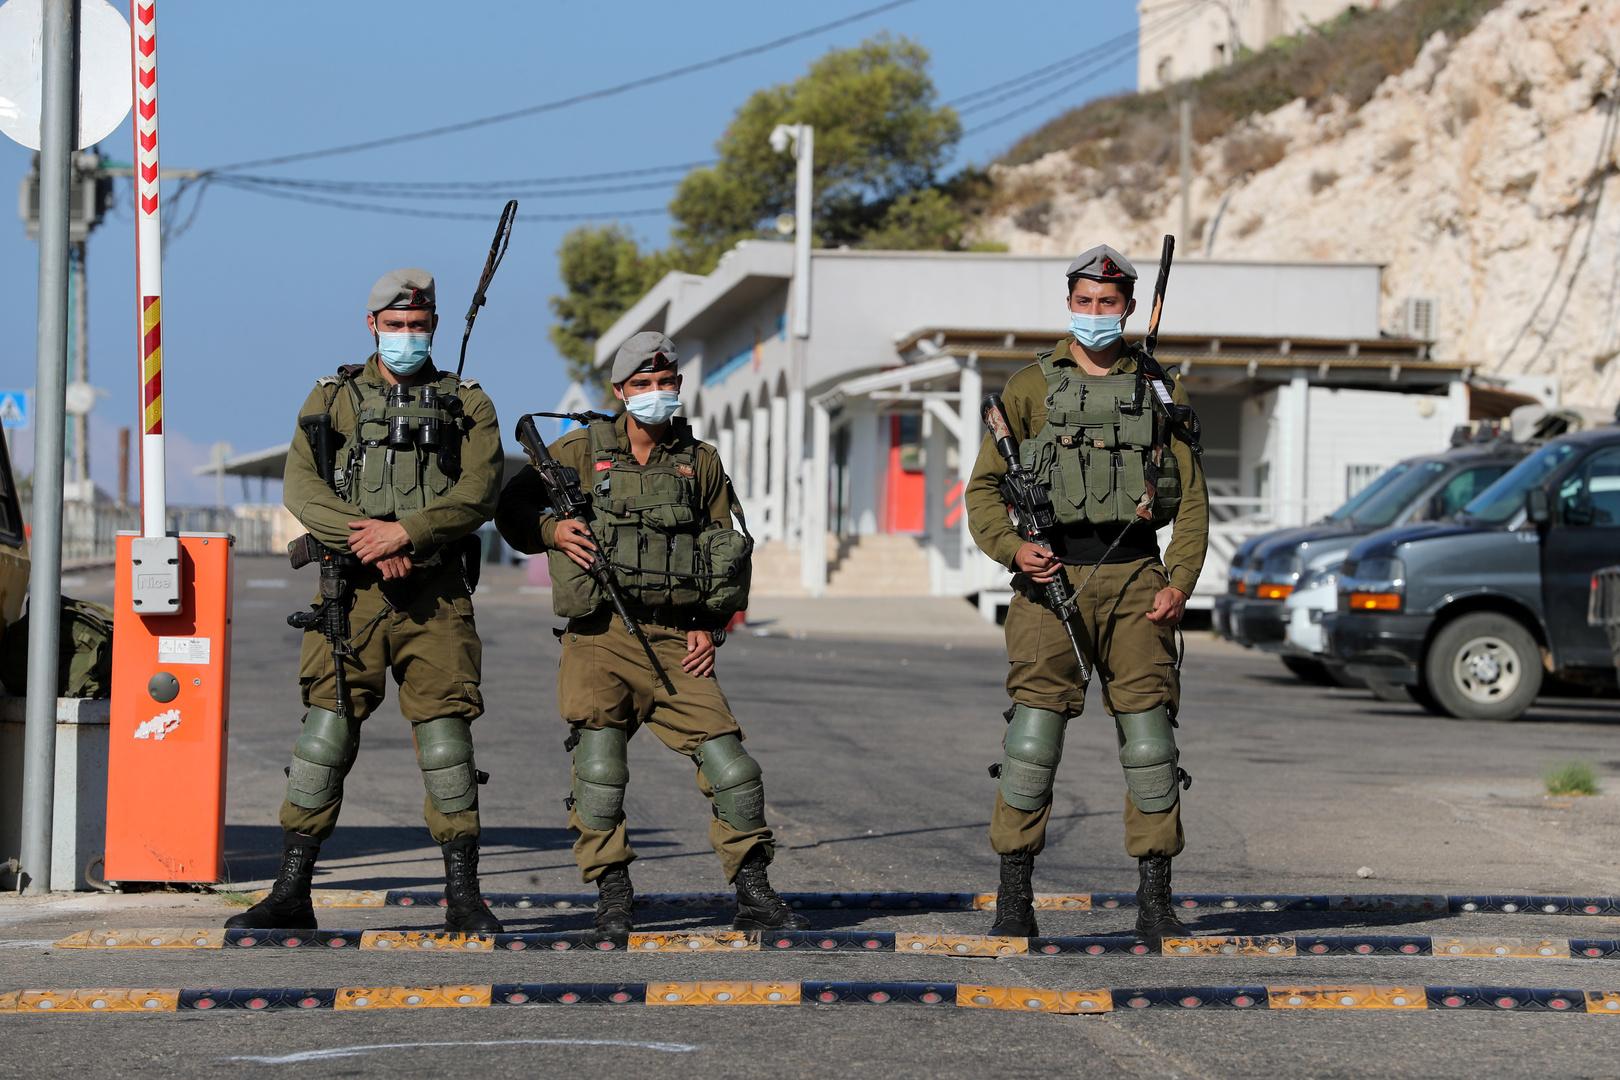 إسرائيل توقف شخصا اجتاز حدود لبنان